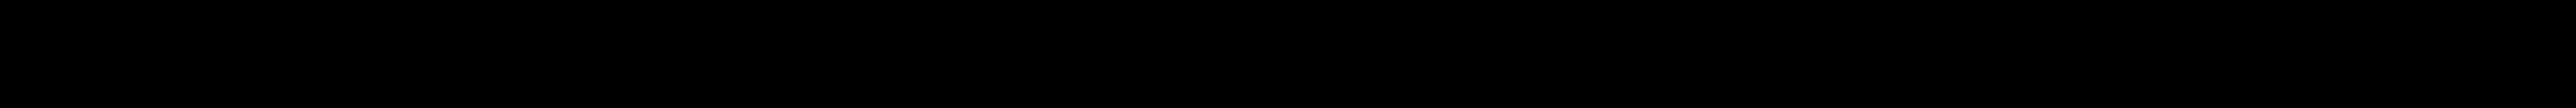 Fibonacci sequence starting with 11